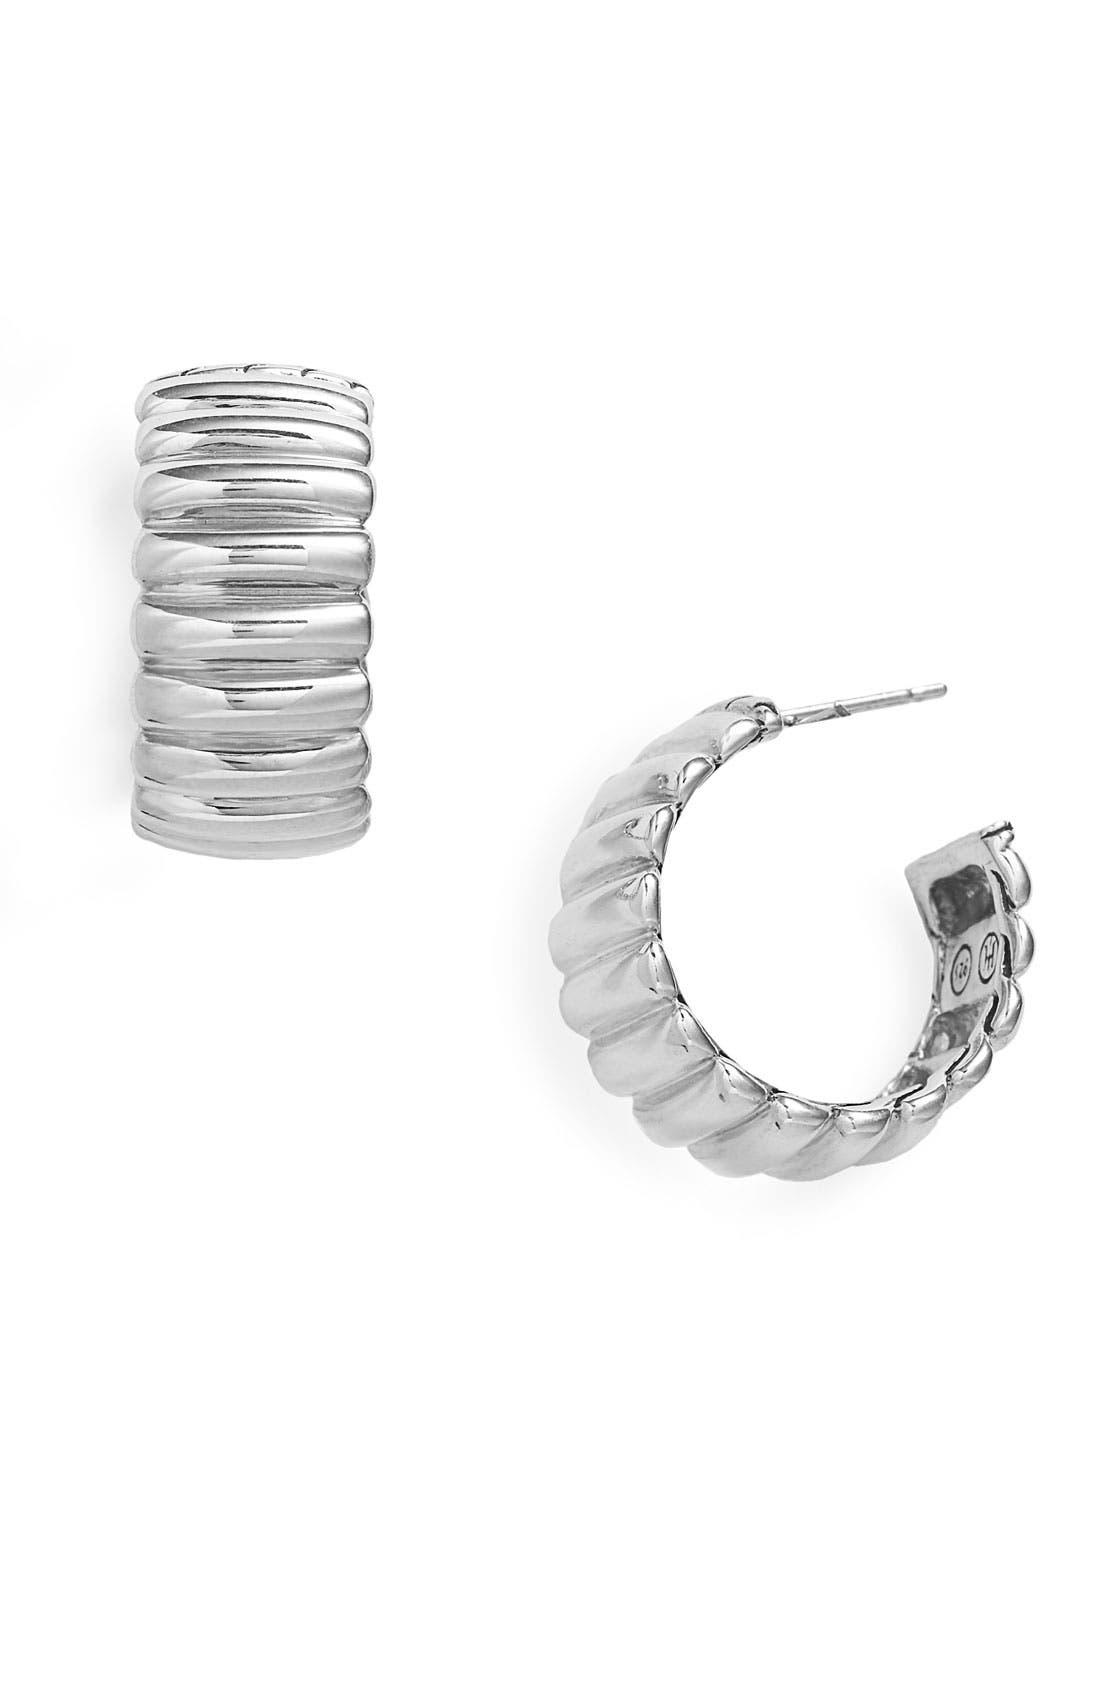 Main Image - John Hardy 'Bedeg' Small Hoop Earrings